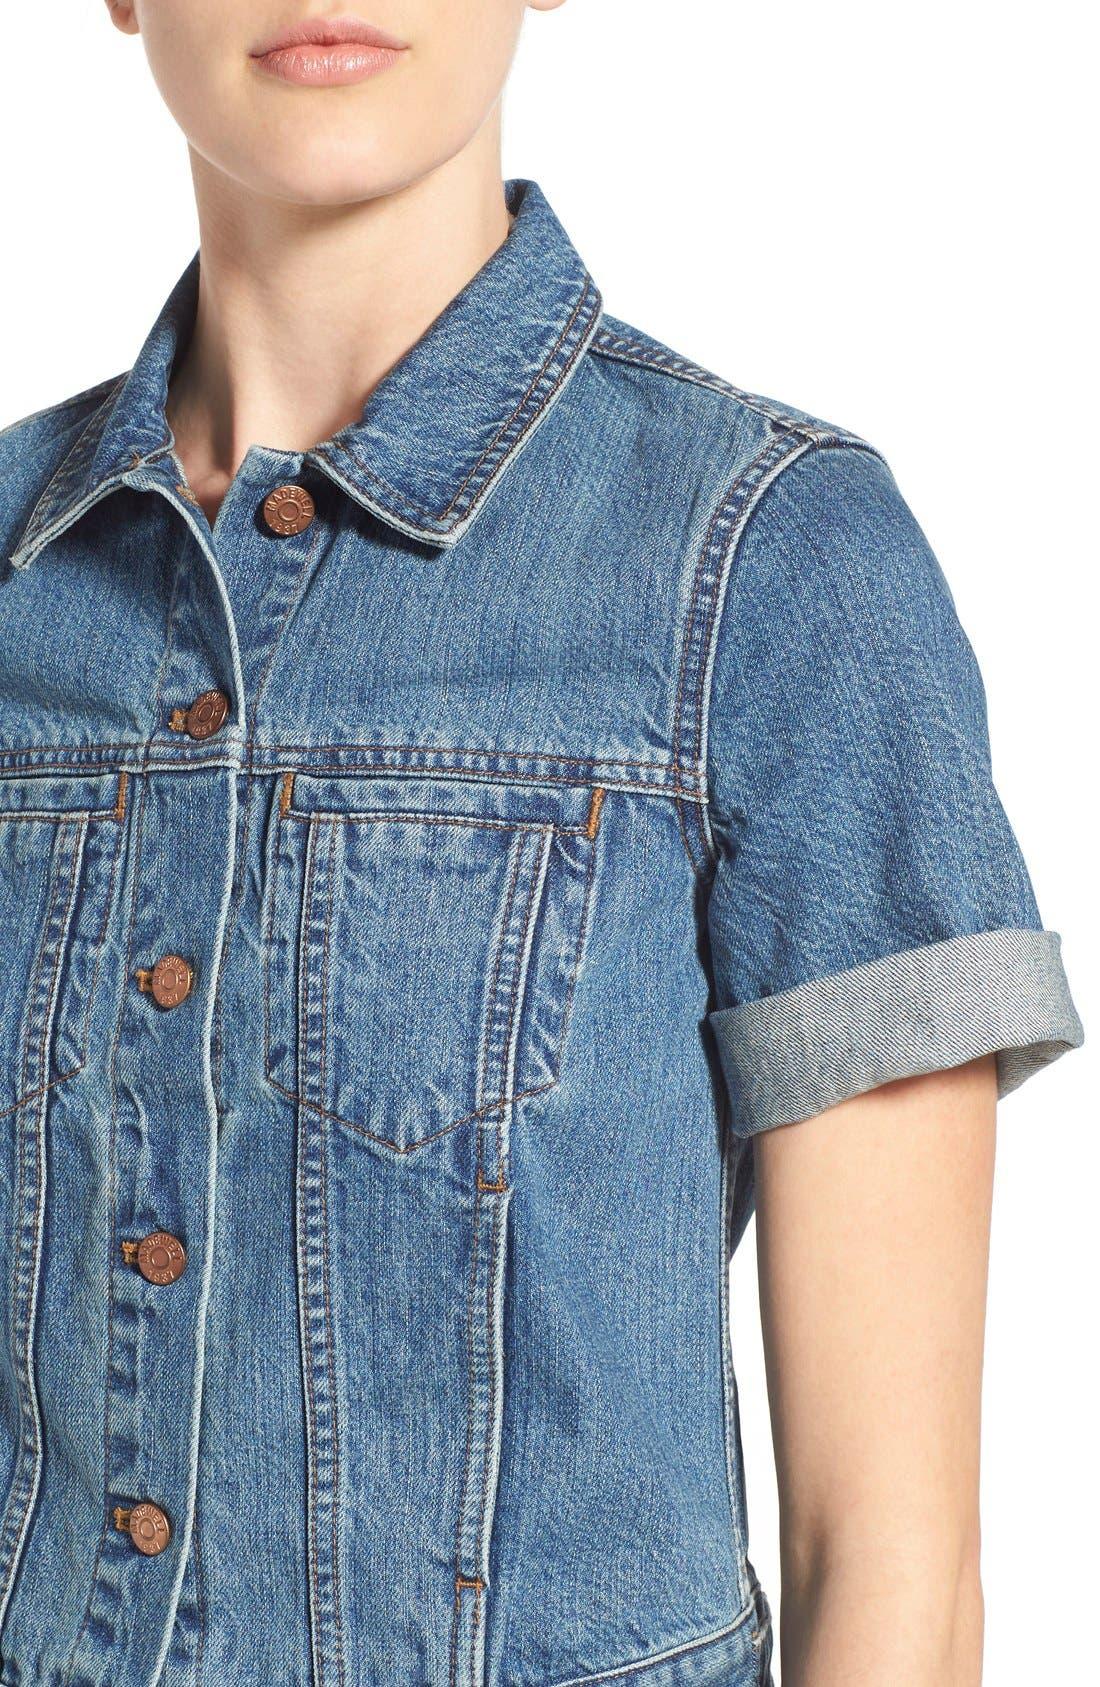 'Summer' Short Sleeve Denim Jacket,                             Alternate thumbnail 2, color,                             407